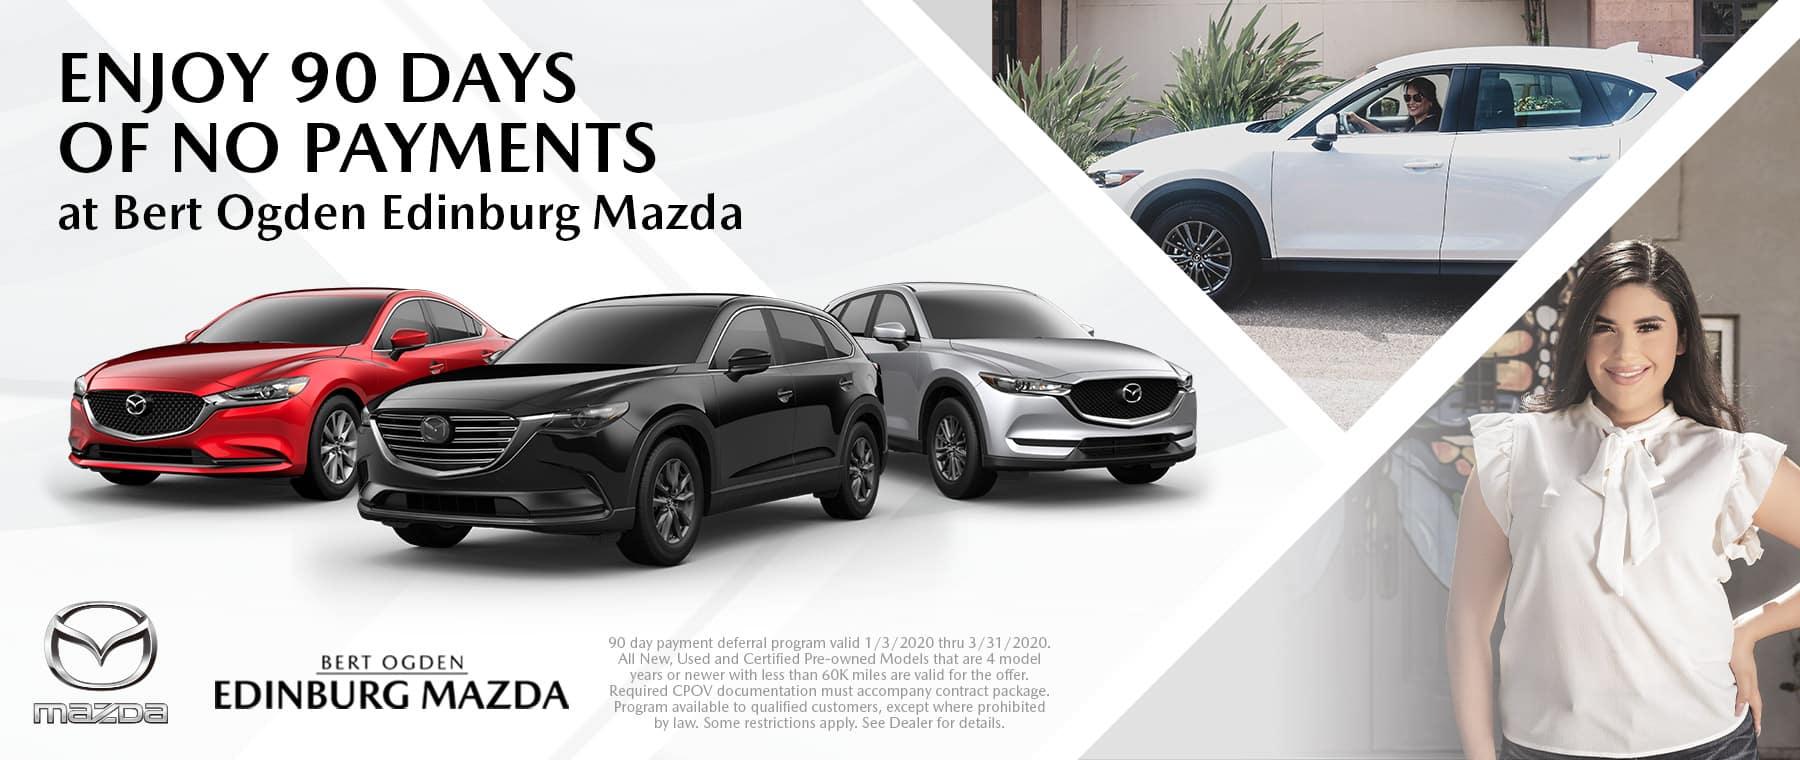 90 Days of No Payments at Bert Ogden Edinburg Mazda in Edinburg, TX